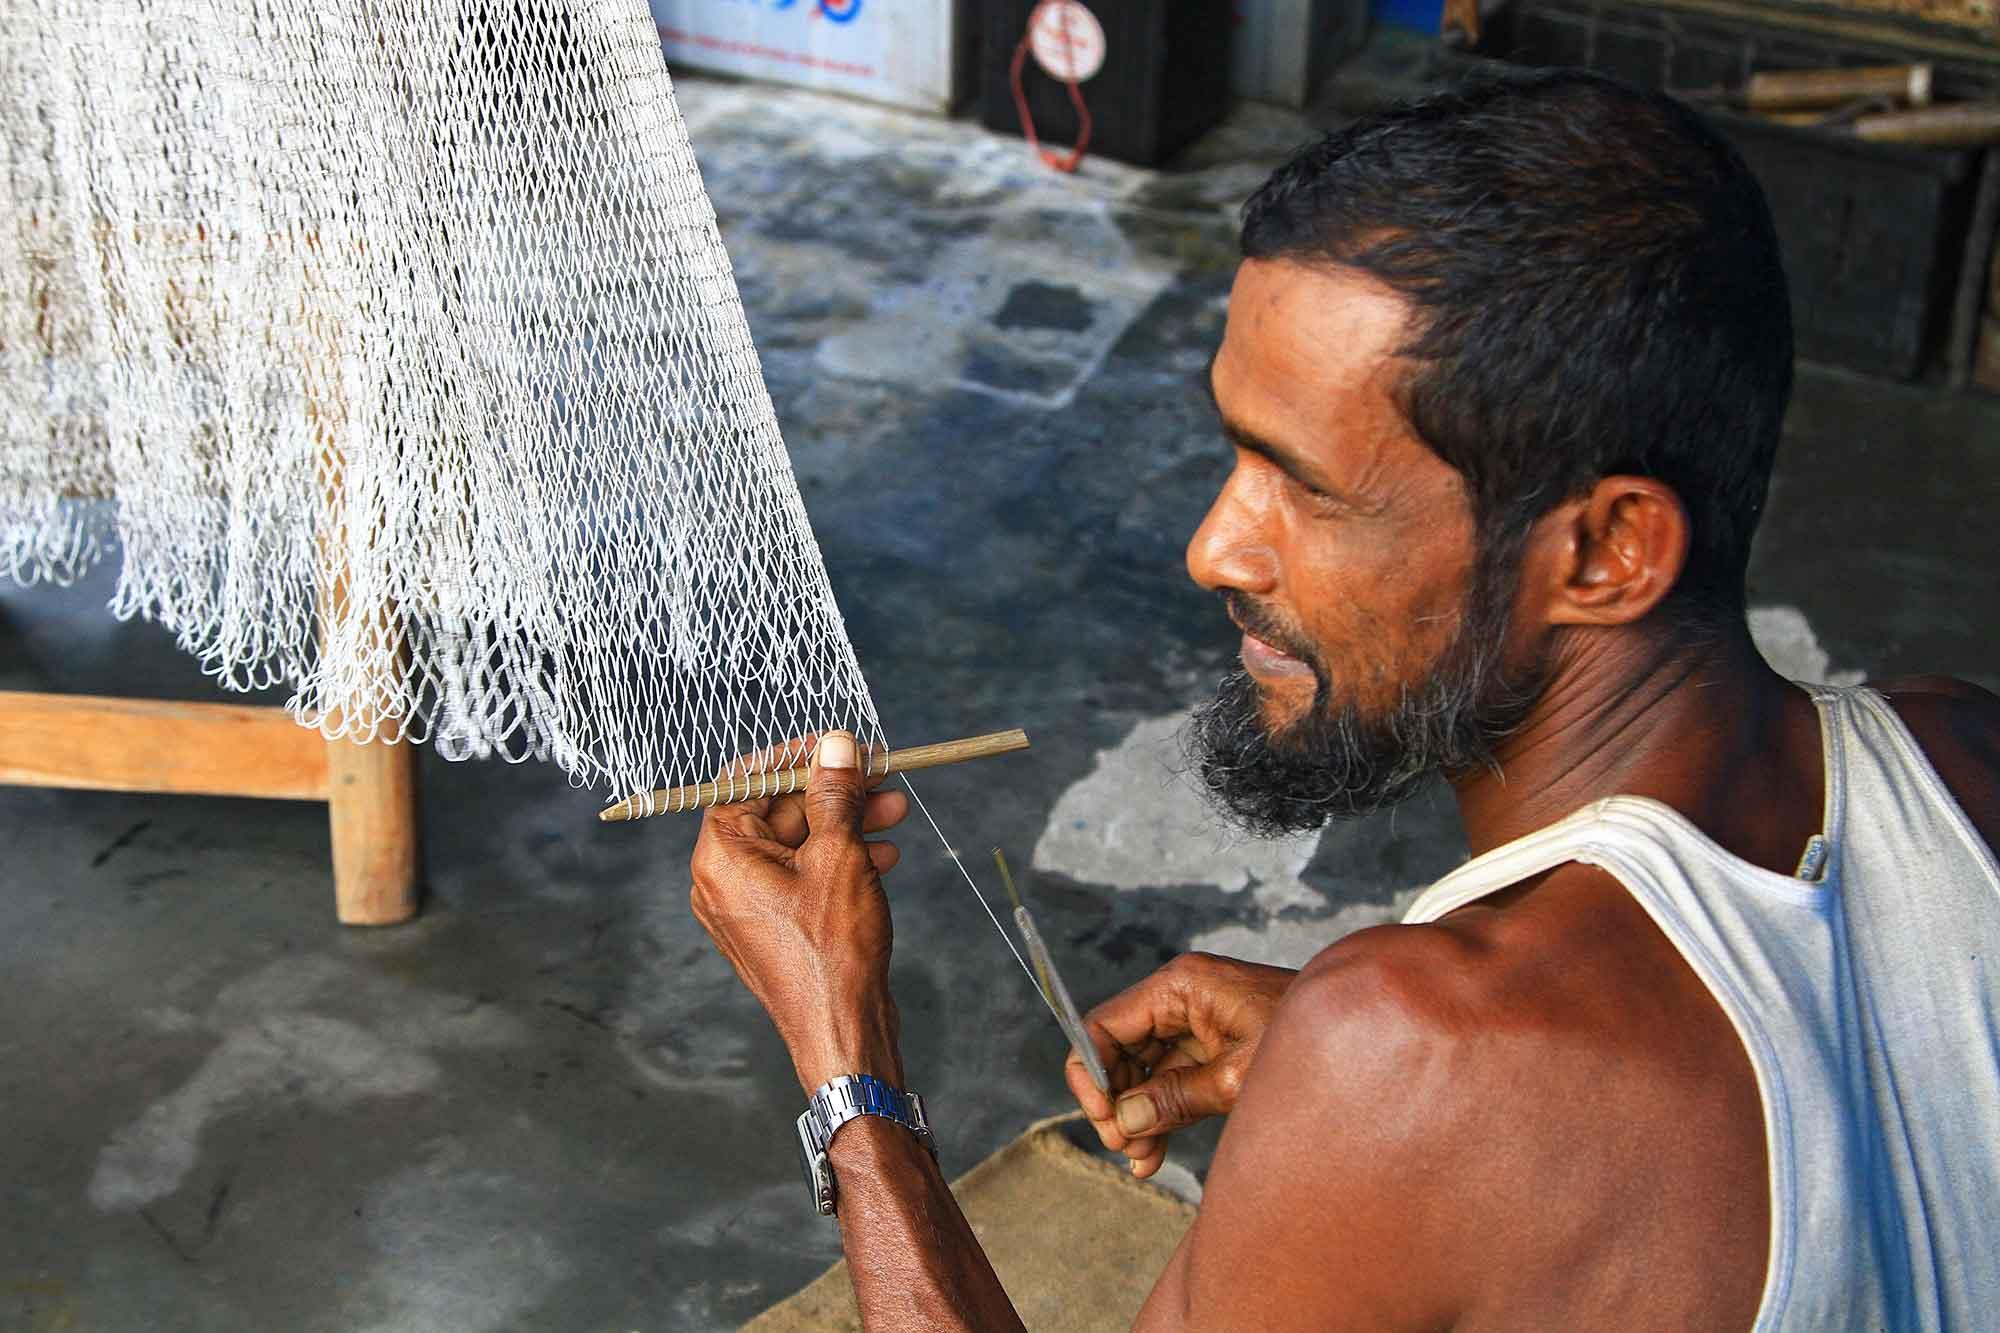 Fishing net production by hand in Kuakata. © Ulli Maier & Nisa Maier